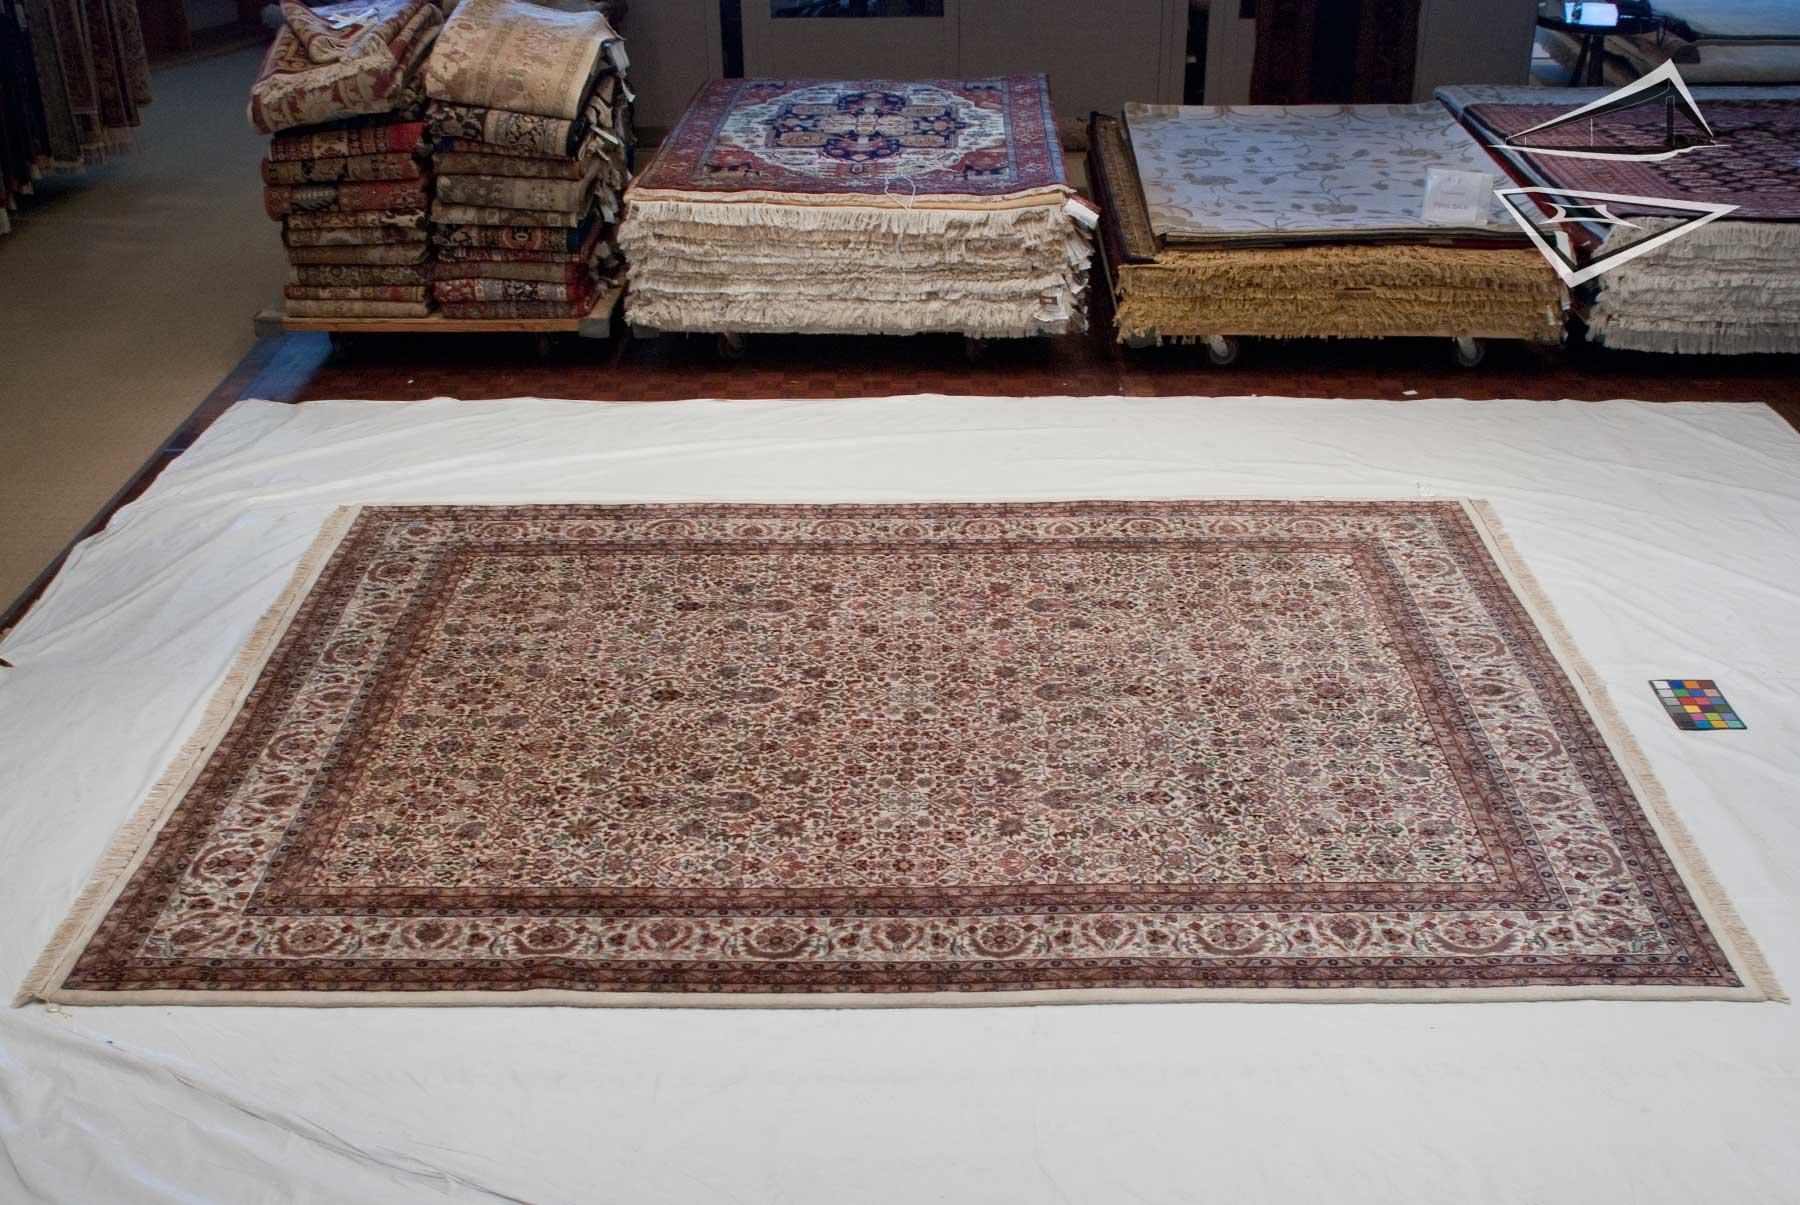 Tabriz design rug 10 39 x 13 39 for 10x13 room layouts